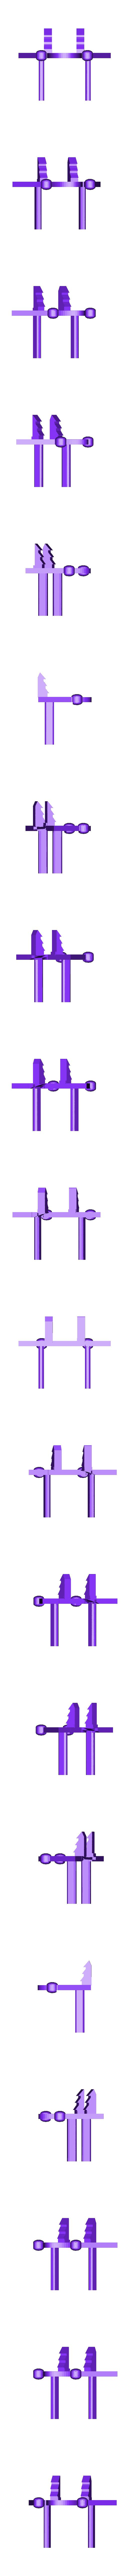 Front keygrip.stl Download STL file Keyboard arrow keys KEYSTICK gaming joystick  • 3D print template, lap88777